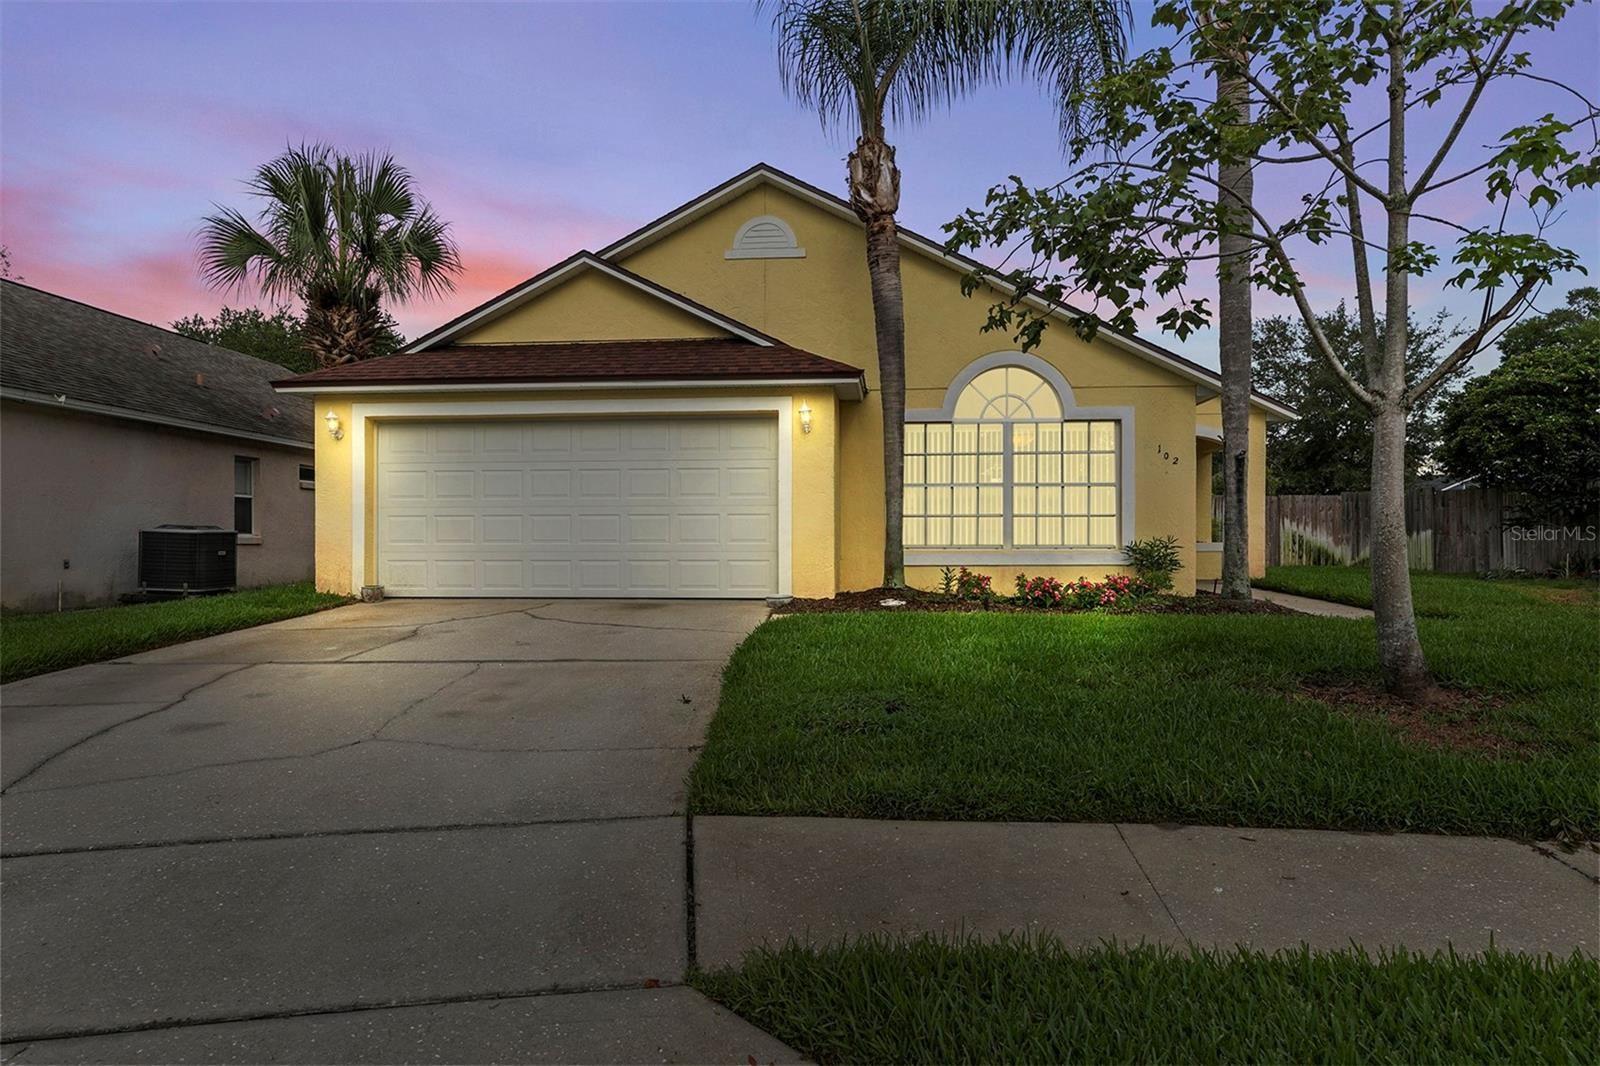 Photo of 102 SANDPEBBLE PLACE, SANFORD, FL 32771 (MLS # O5953753)